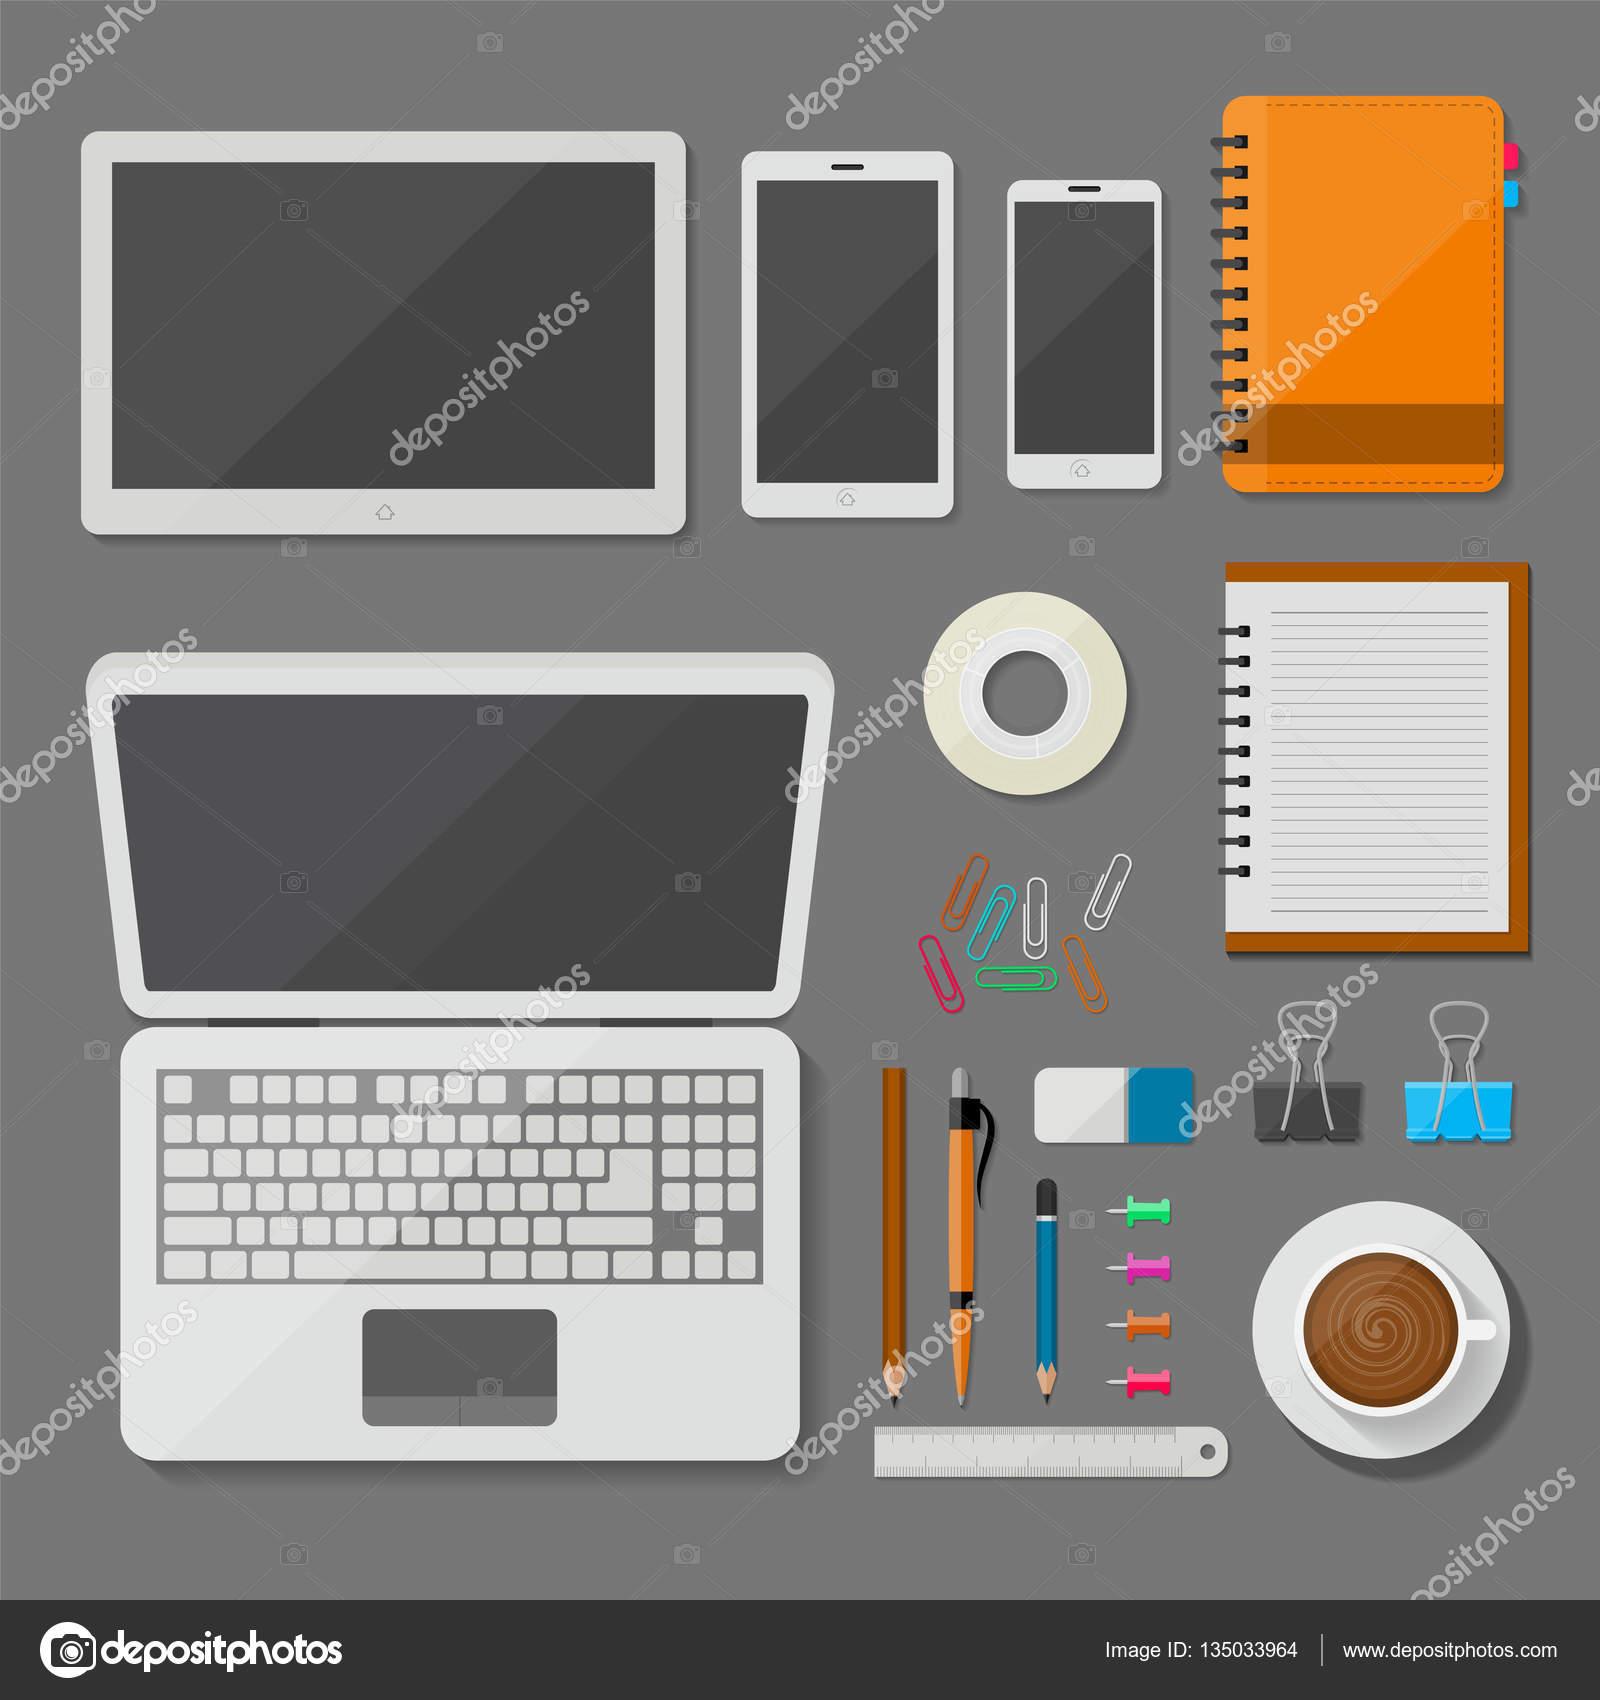 Top vista laptop tablet smartphone e com escritrio no local de vista superior notebook tablet smartphone e local de trabalho com itens de escritrio e negcios design de vetor de elementos no conceito de mesa foto ccuart Gallery